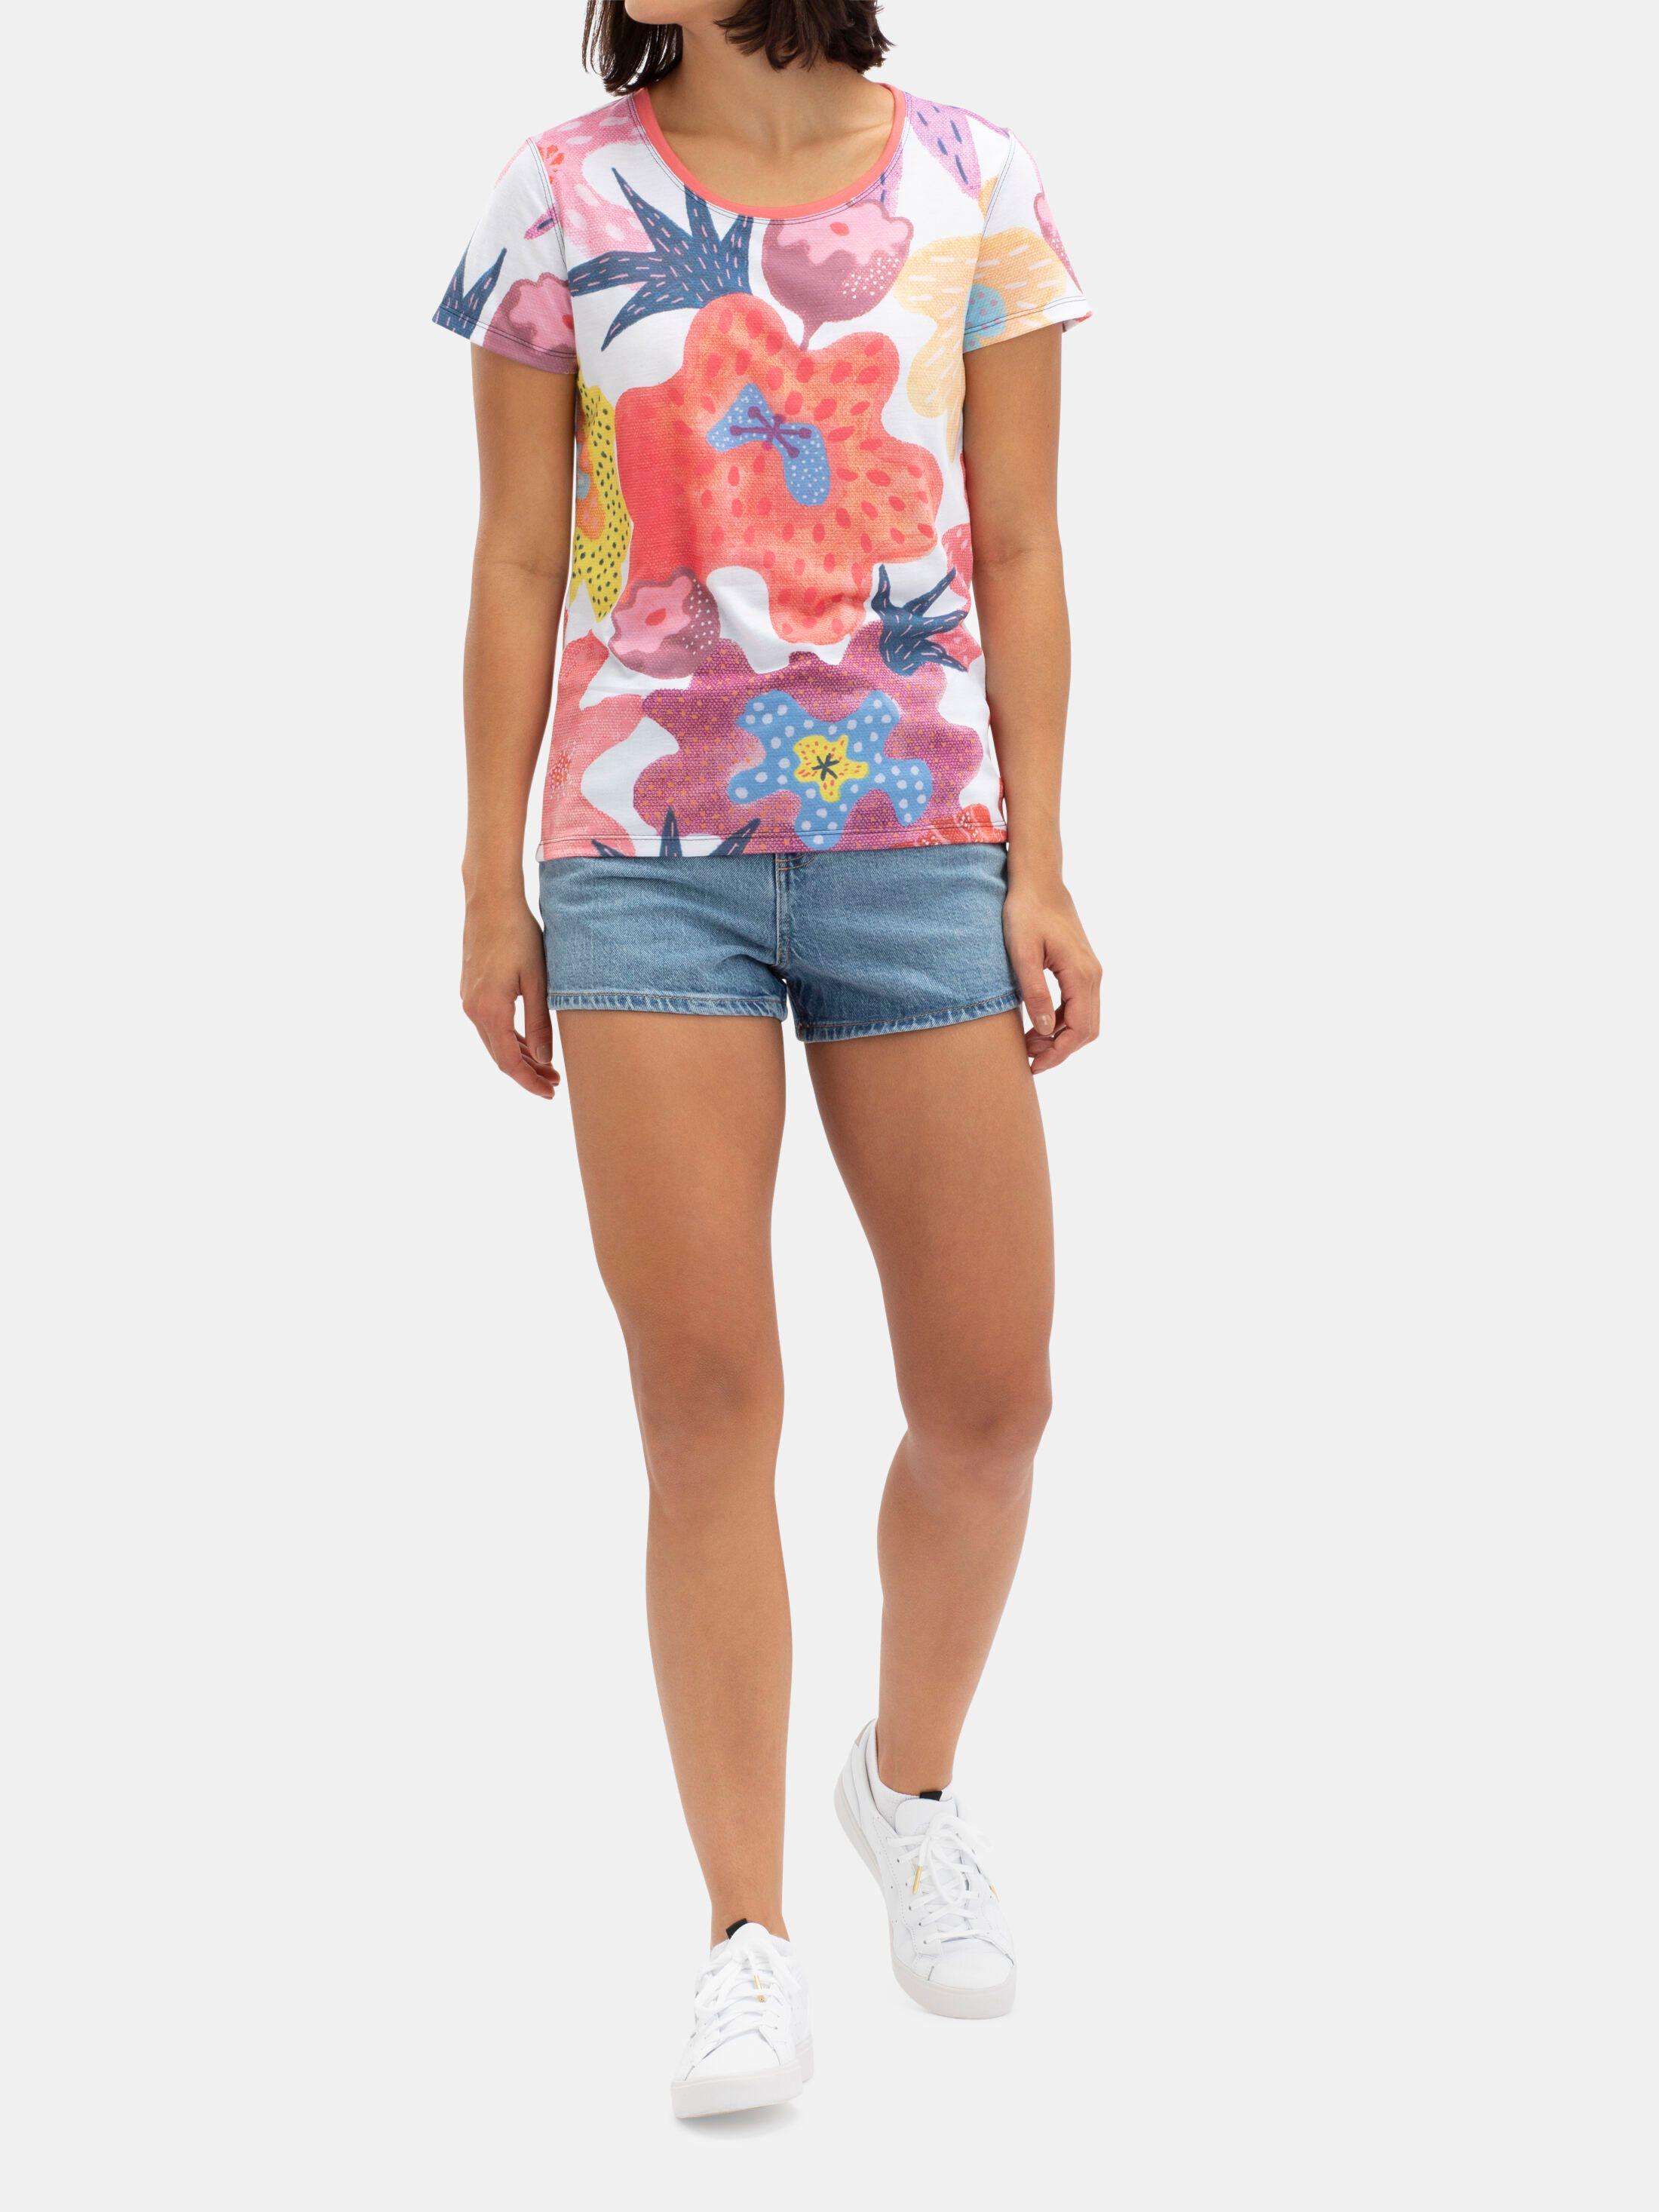 Design your own women's custom regular fit t-shirt